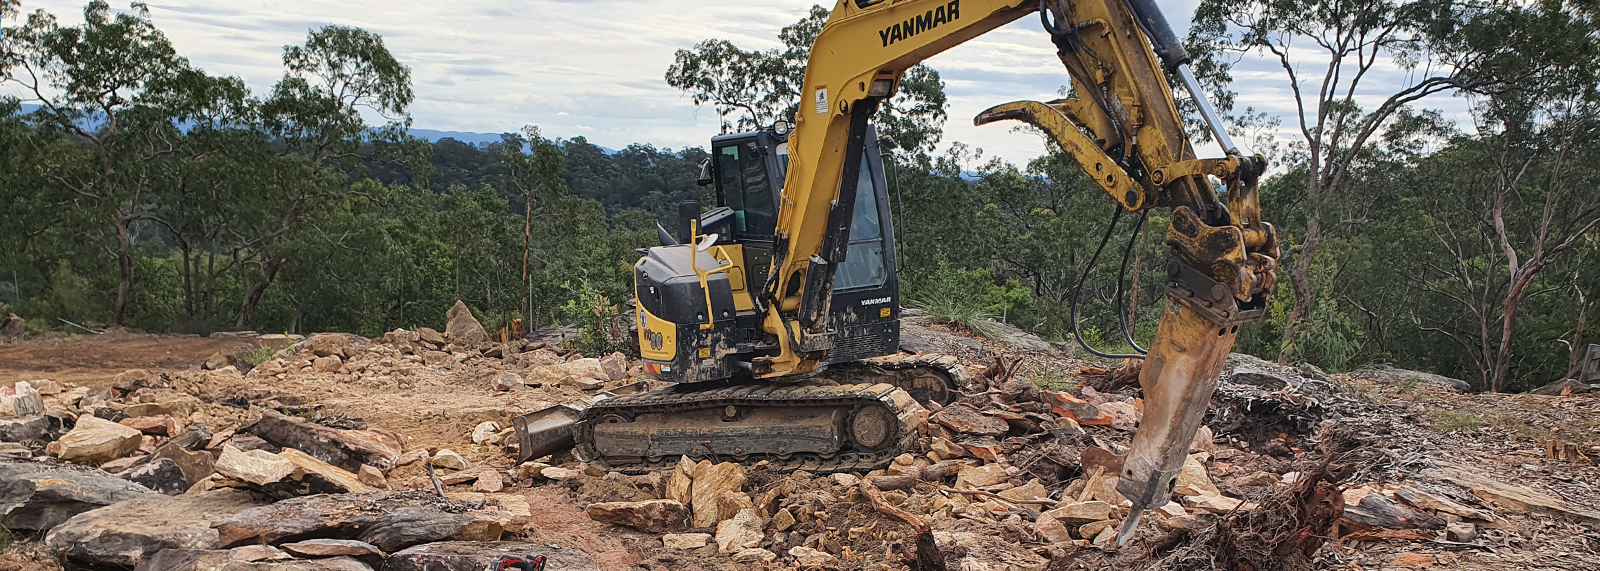 Sydney Earthmoving & Demolition Pty Ltd